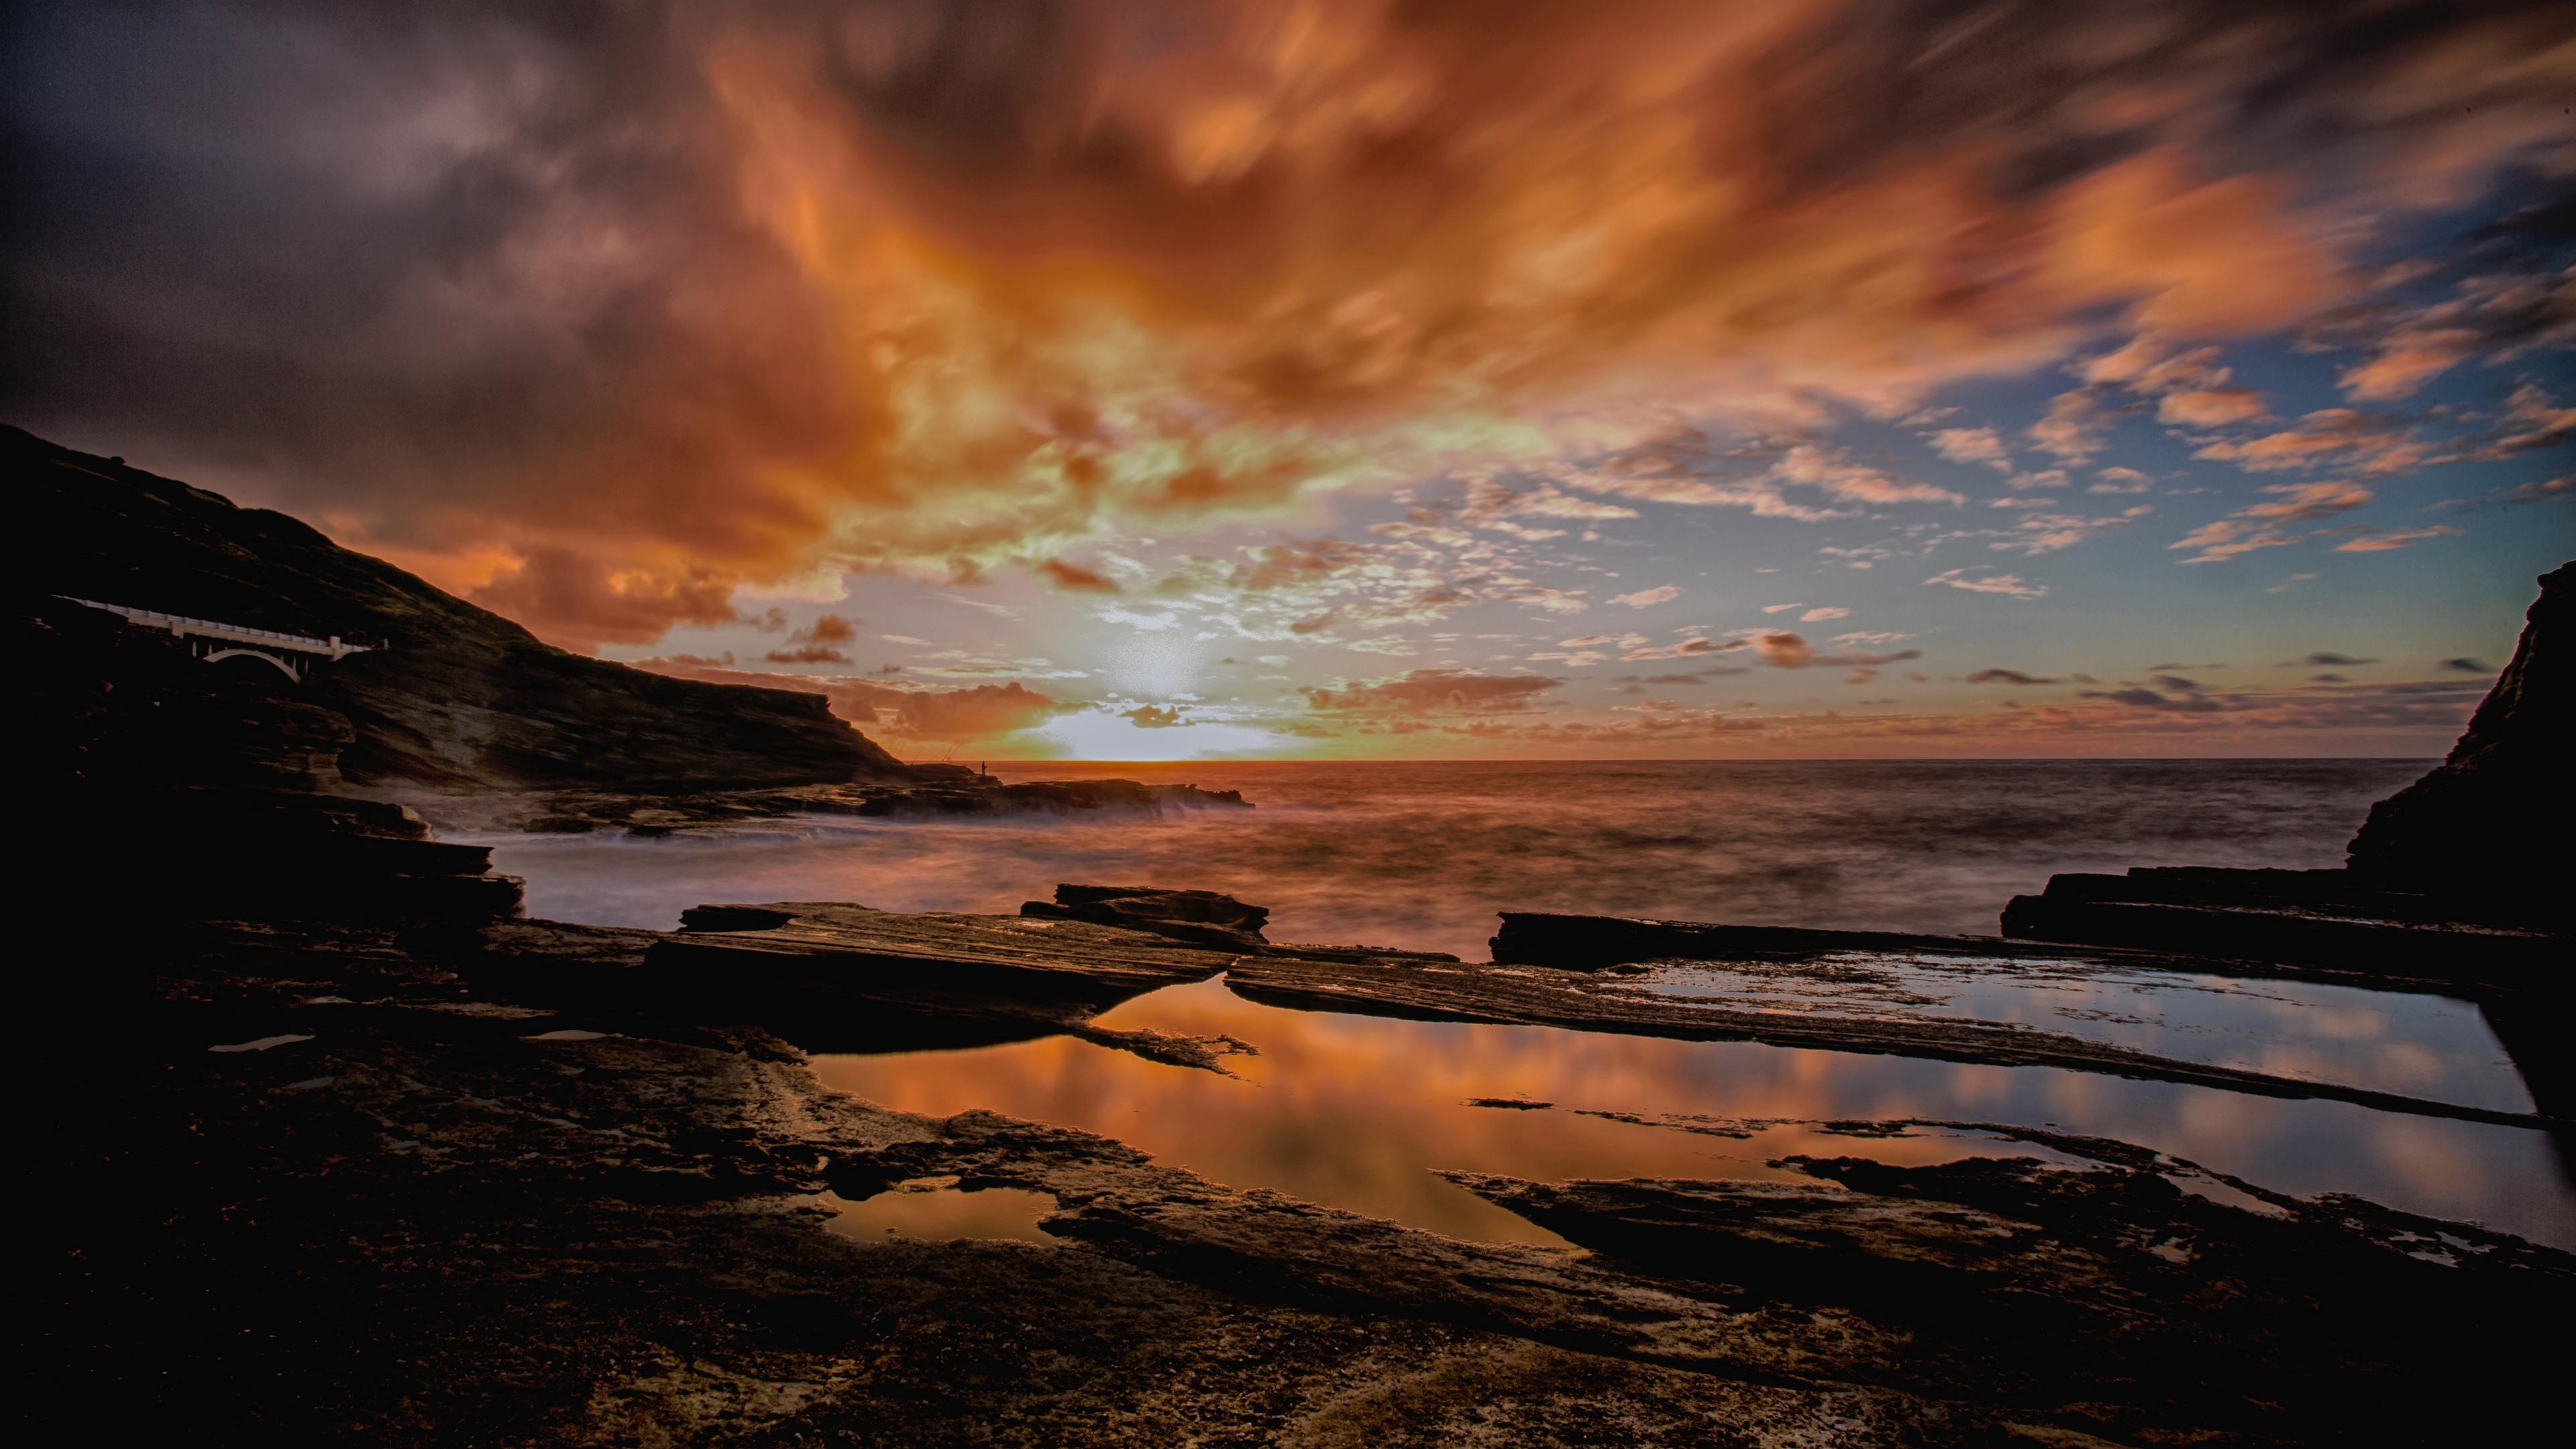 backlit dusk dawn seashore 4k 1551643412 - Backlit Dusk Dawn Seashore 4k - seashore wallpapers, nature wallpapers, hd-wallpapers, dusk wallpapers, dawn wallpapers, 4k-wallpapers